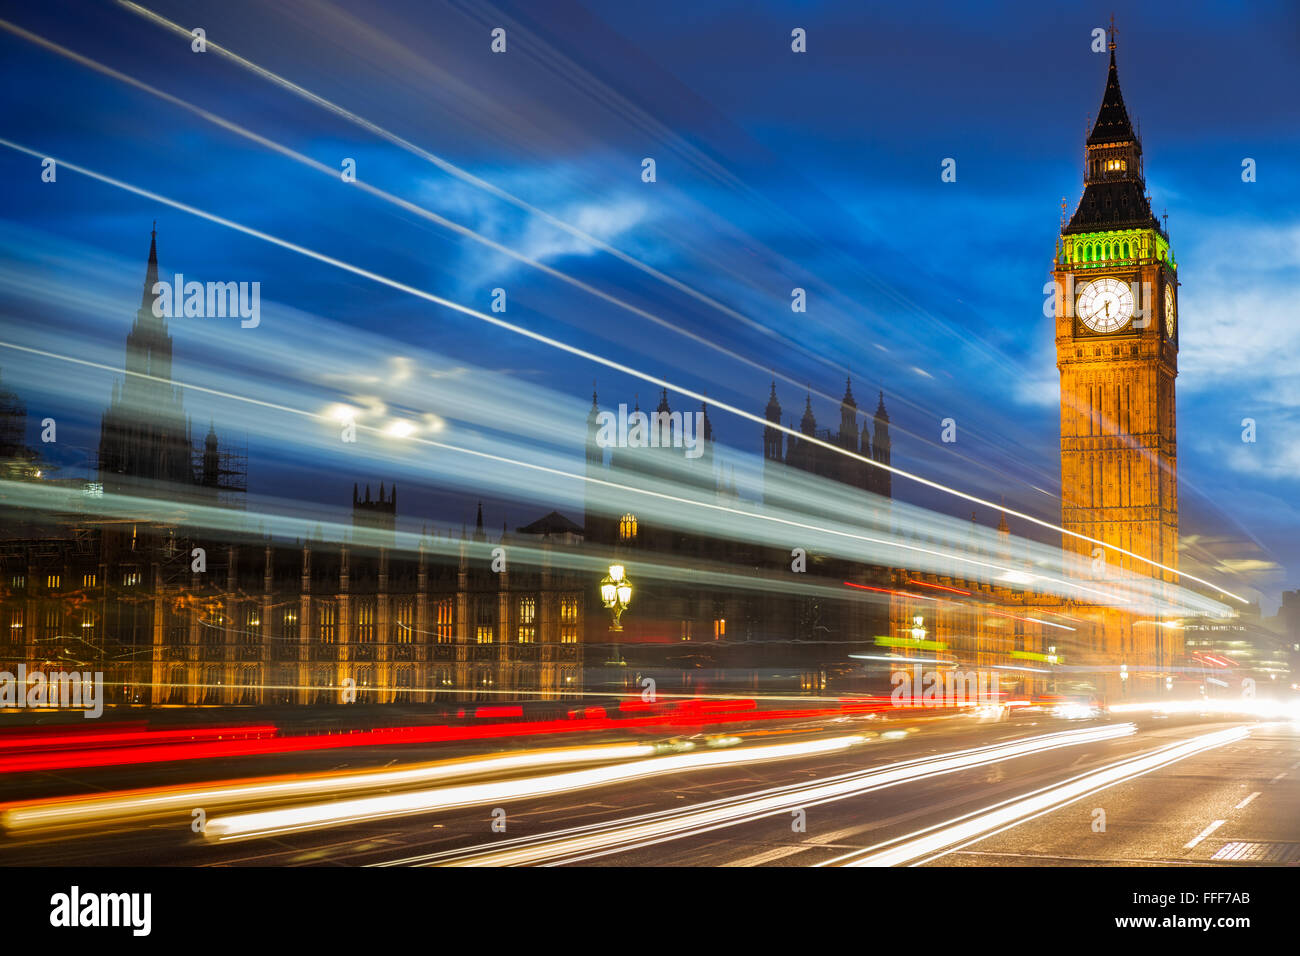 Big Ben at Westminster Bridge, London, UK - Stock Image